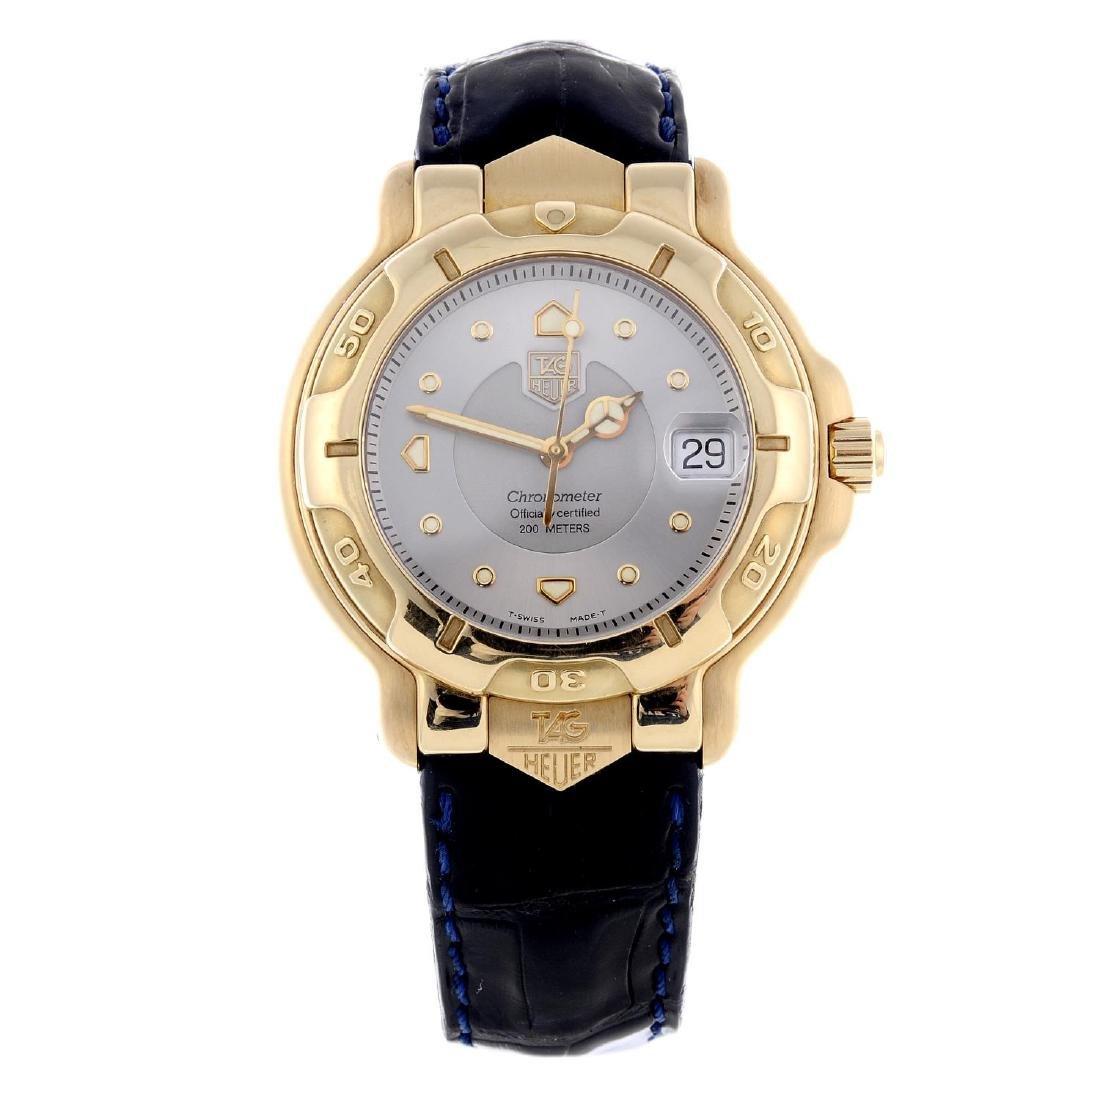 TAG HEUER - a gentleman's 6000 Series wrist watch. 18ct